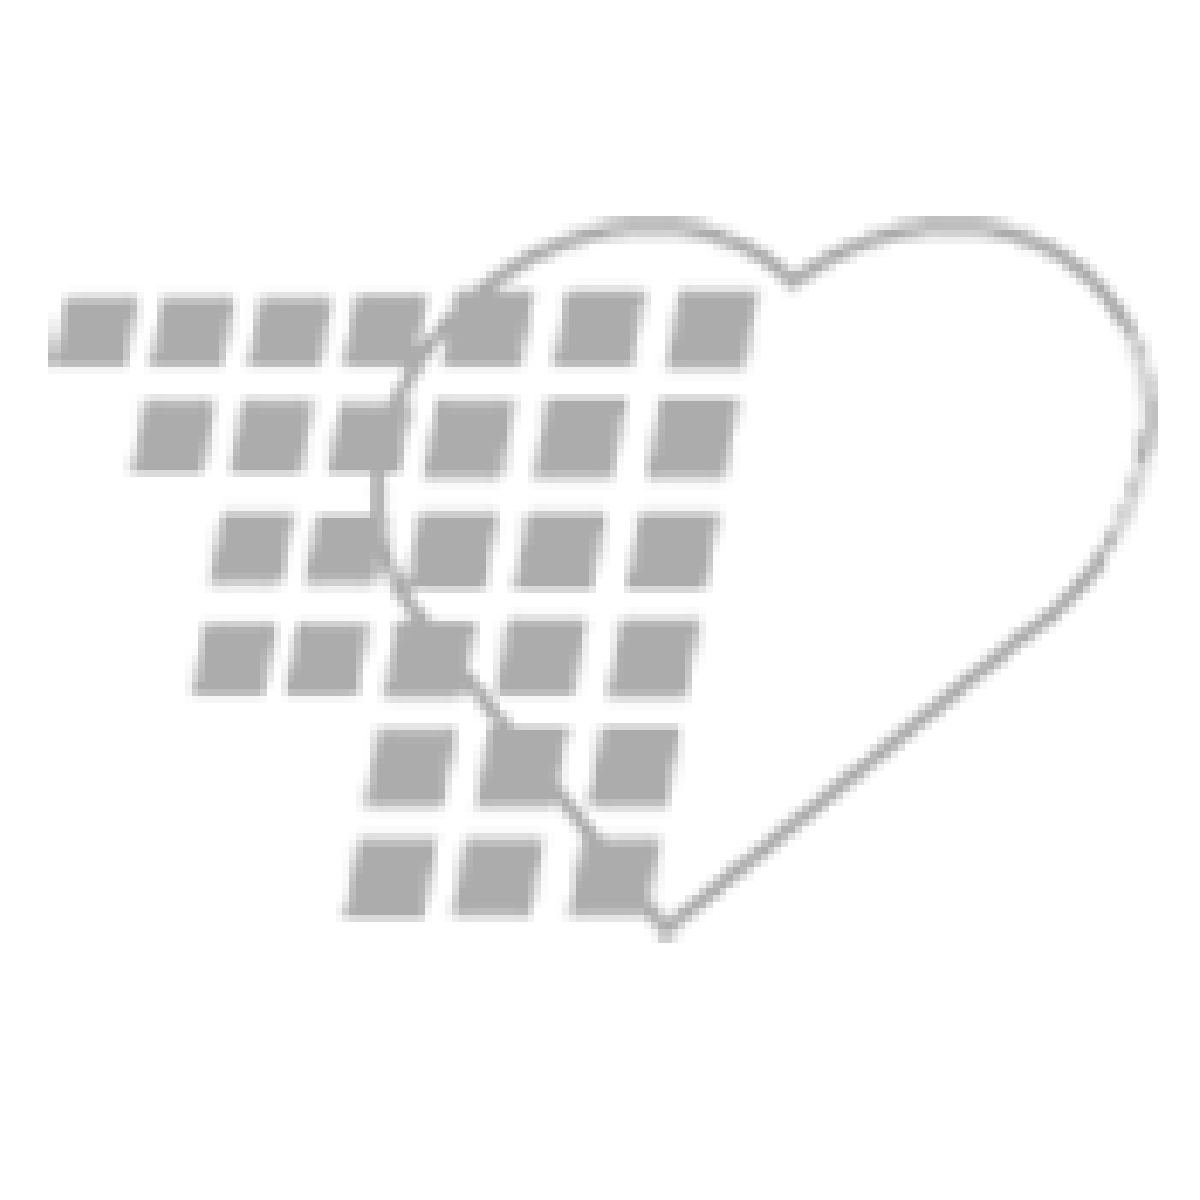 06-93-1703 Demo Dose® Tablet Brown Medium Round - 1000 Pills/Jar